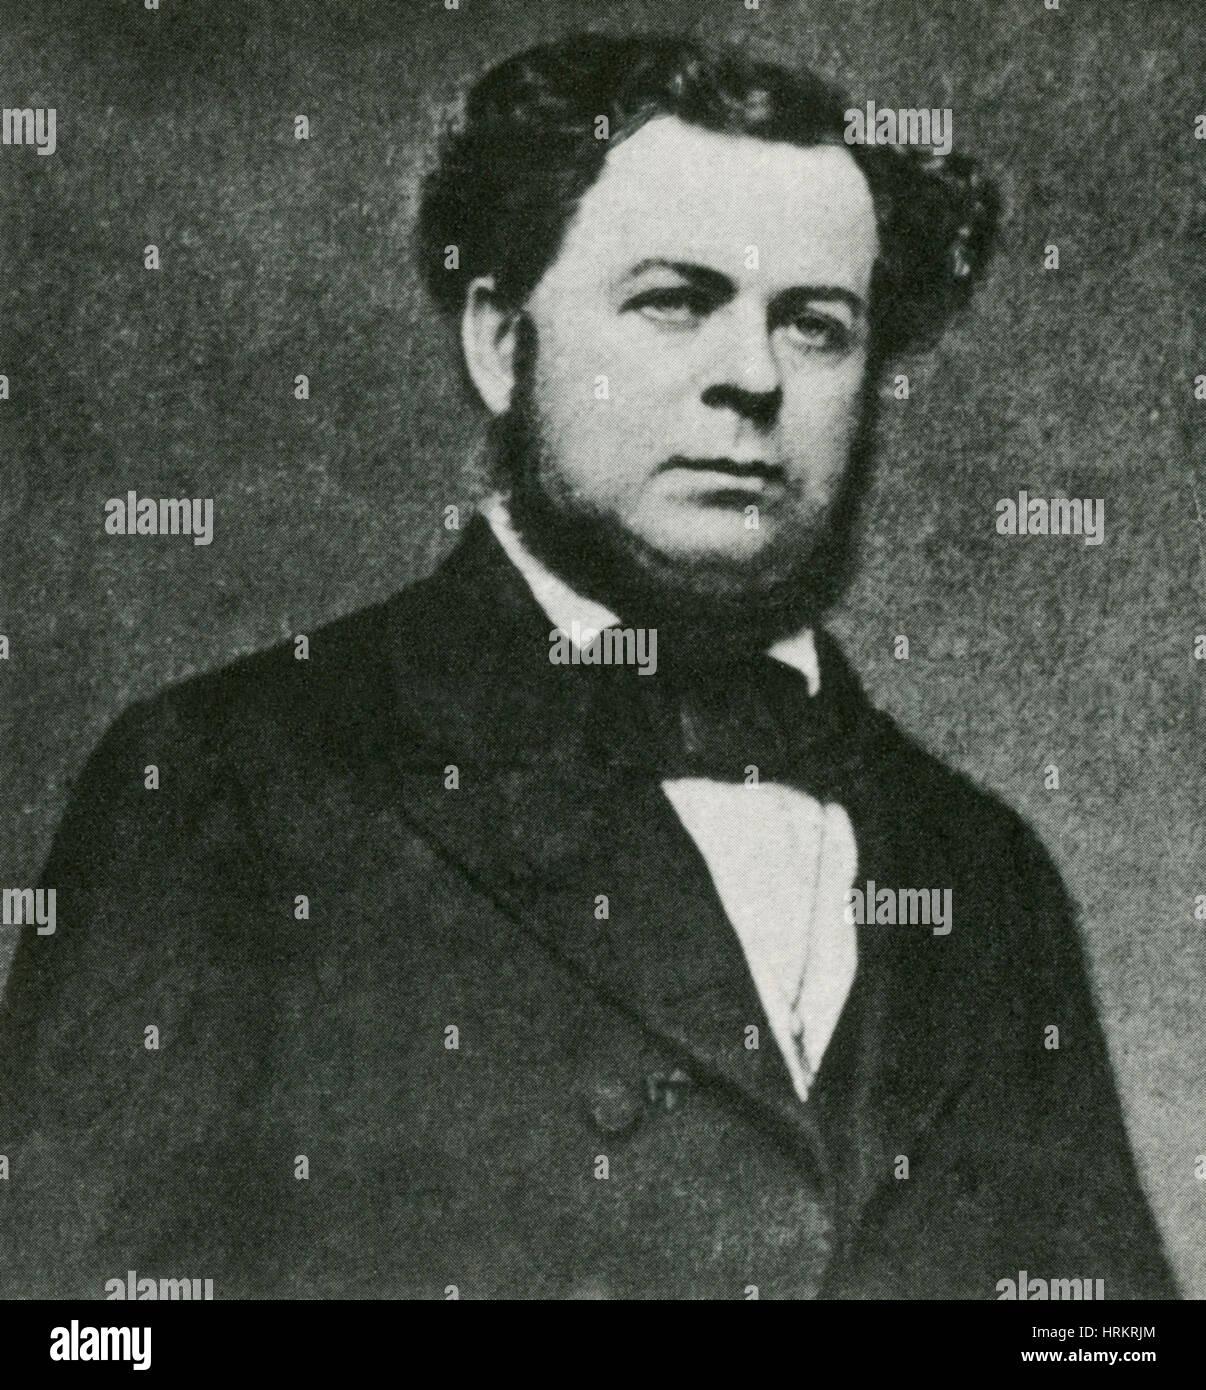 Stephen Mallory, American Politician - Stock Image